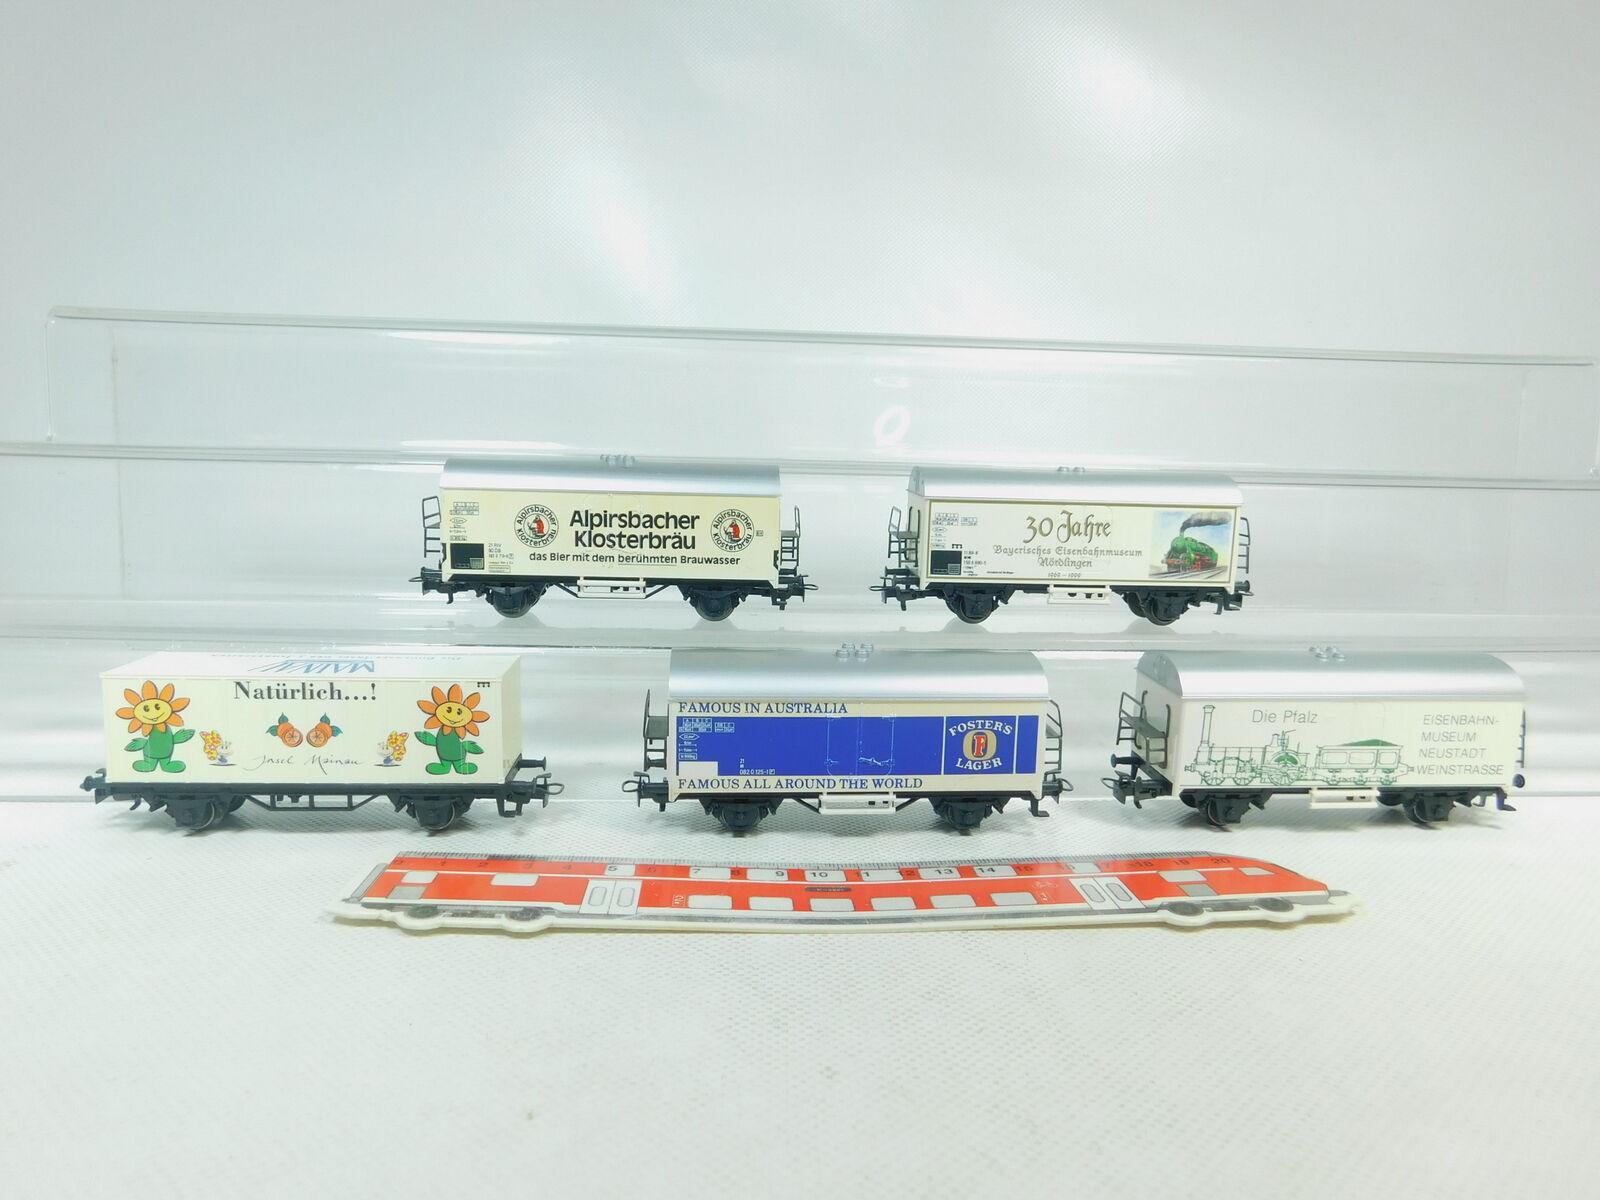 Bm487-1x Märklin h0 ac freight wagons  ALPIRSBACHER + Foster's + Mainau etc